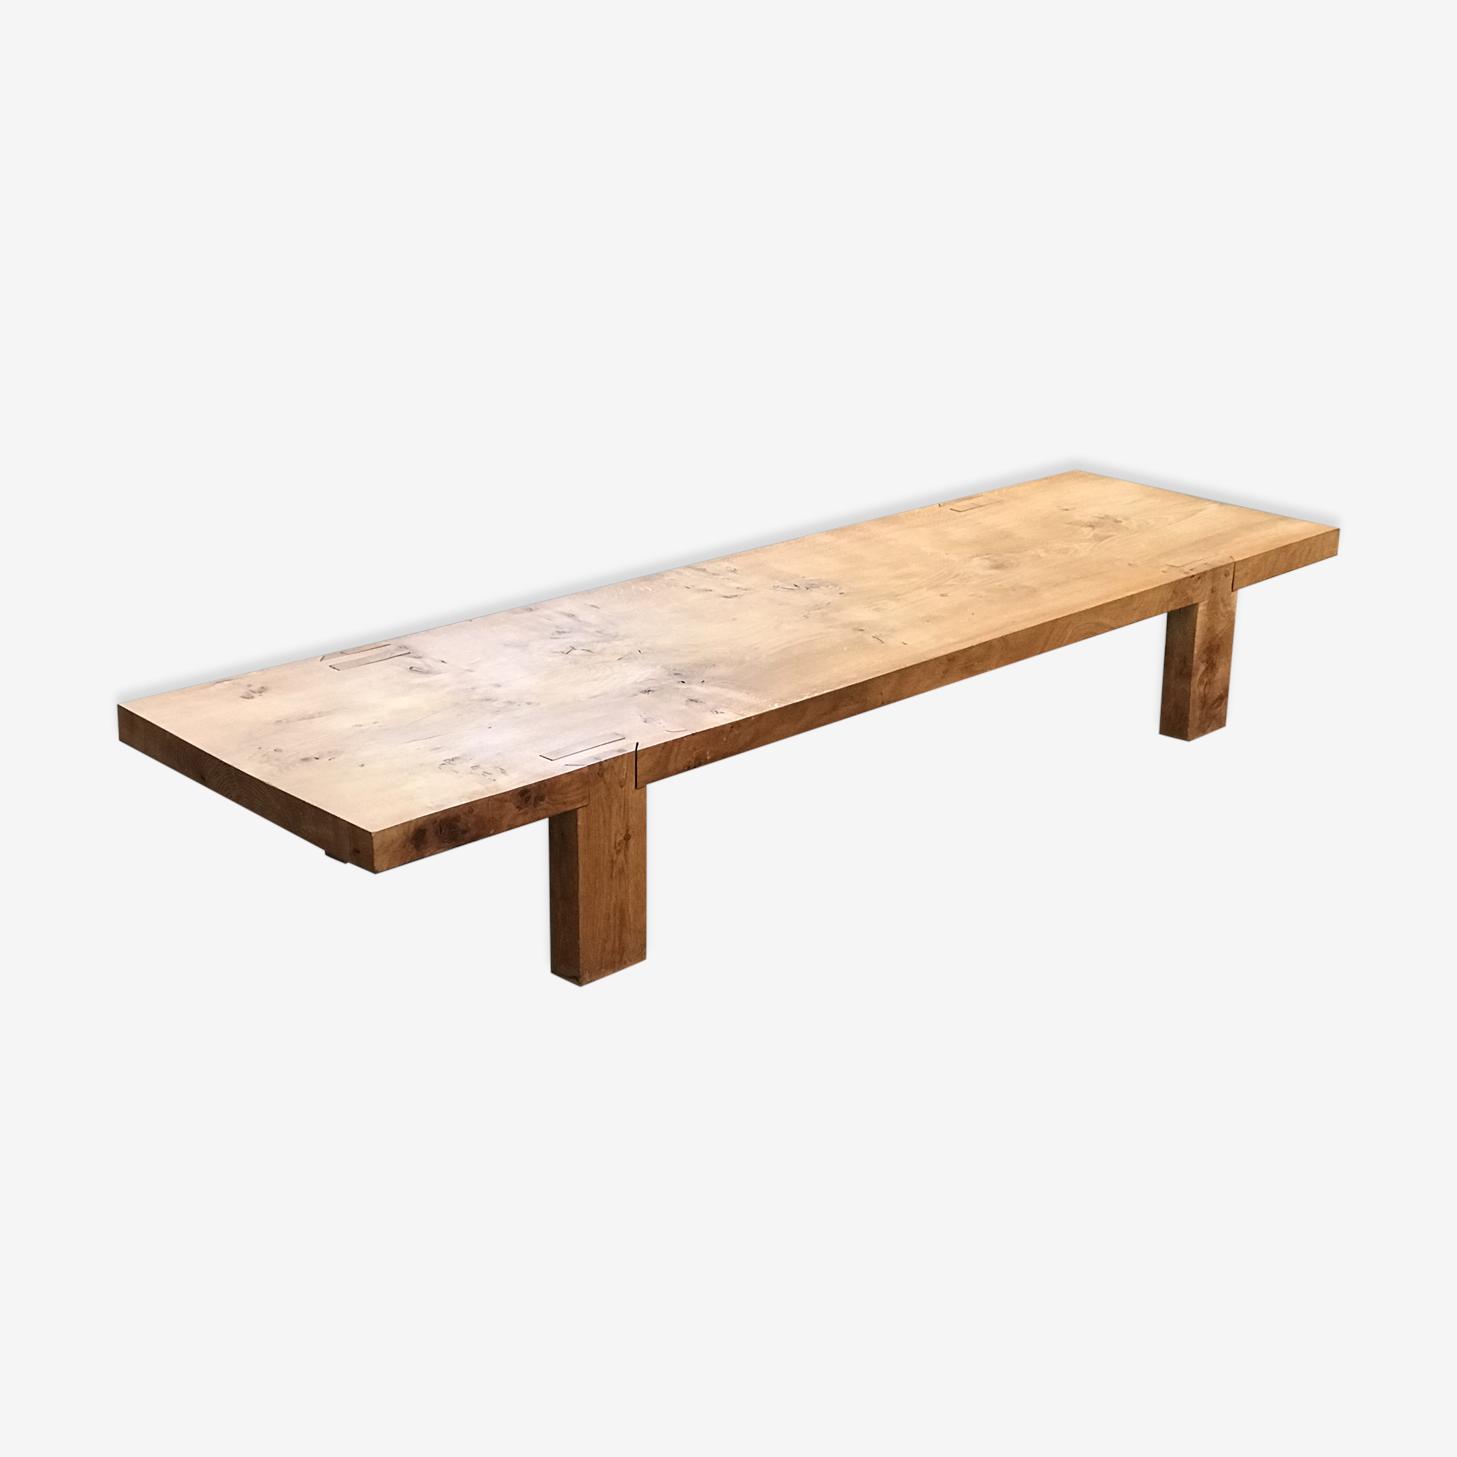 Coffee table designed by Eugène Leseney